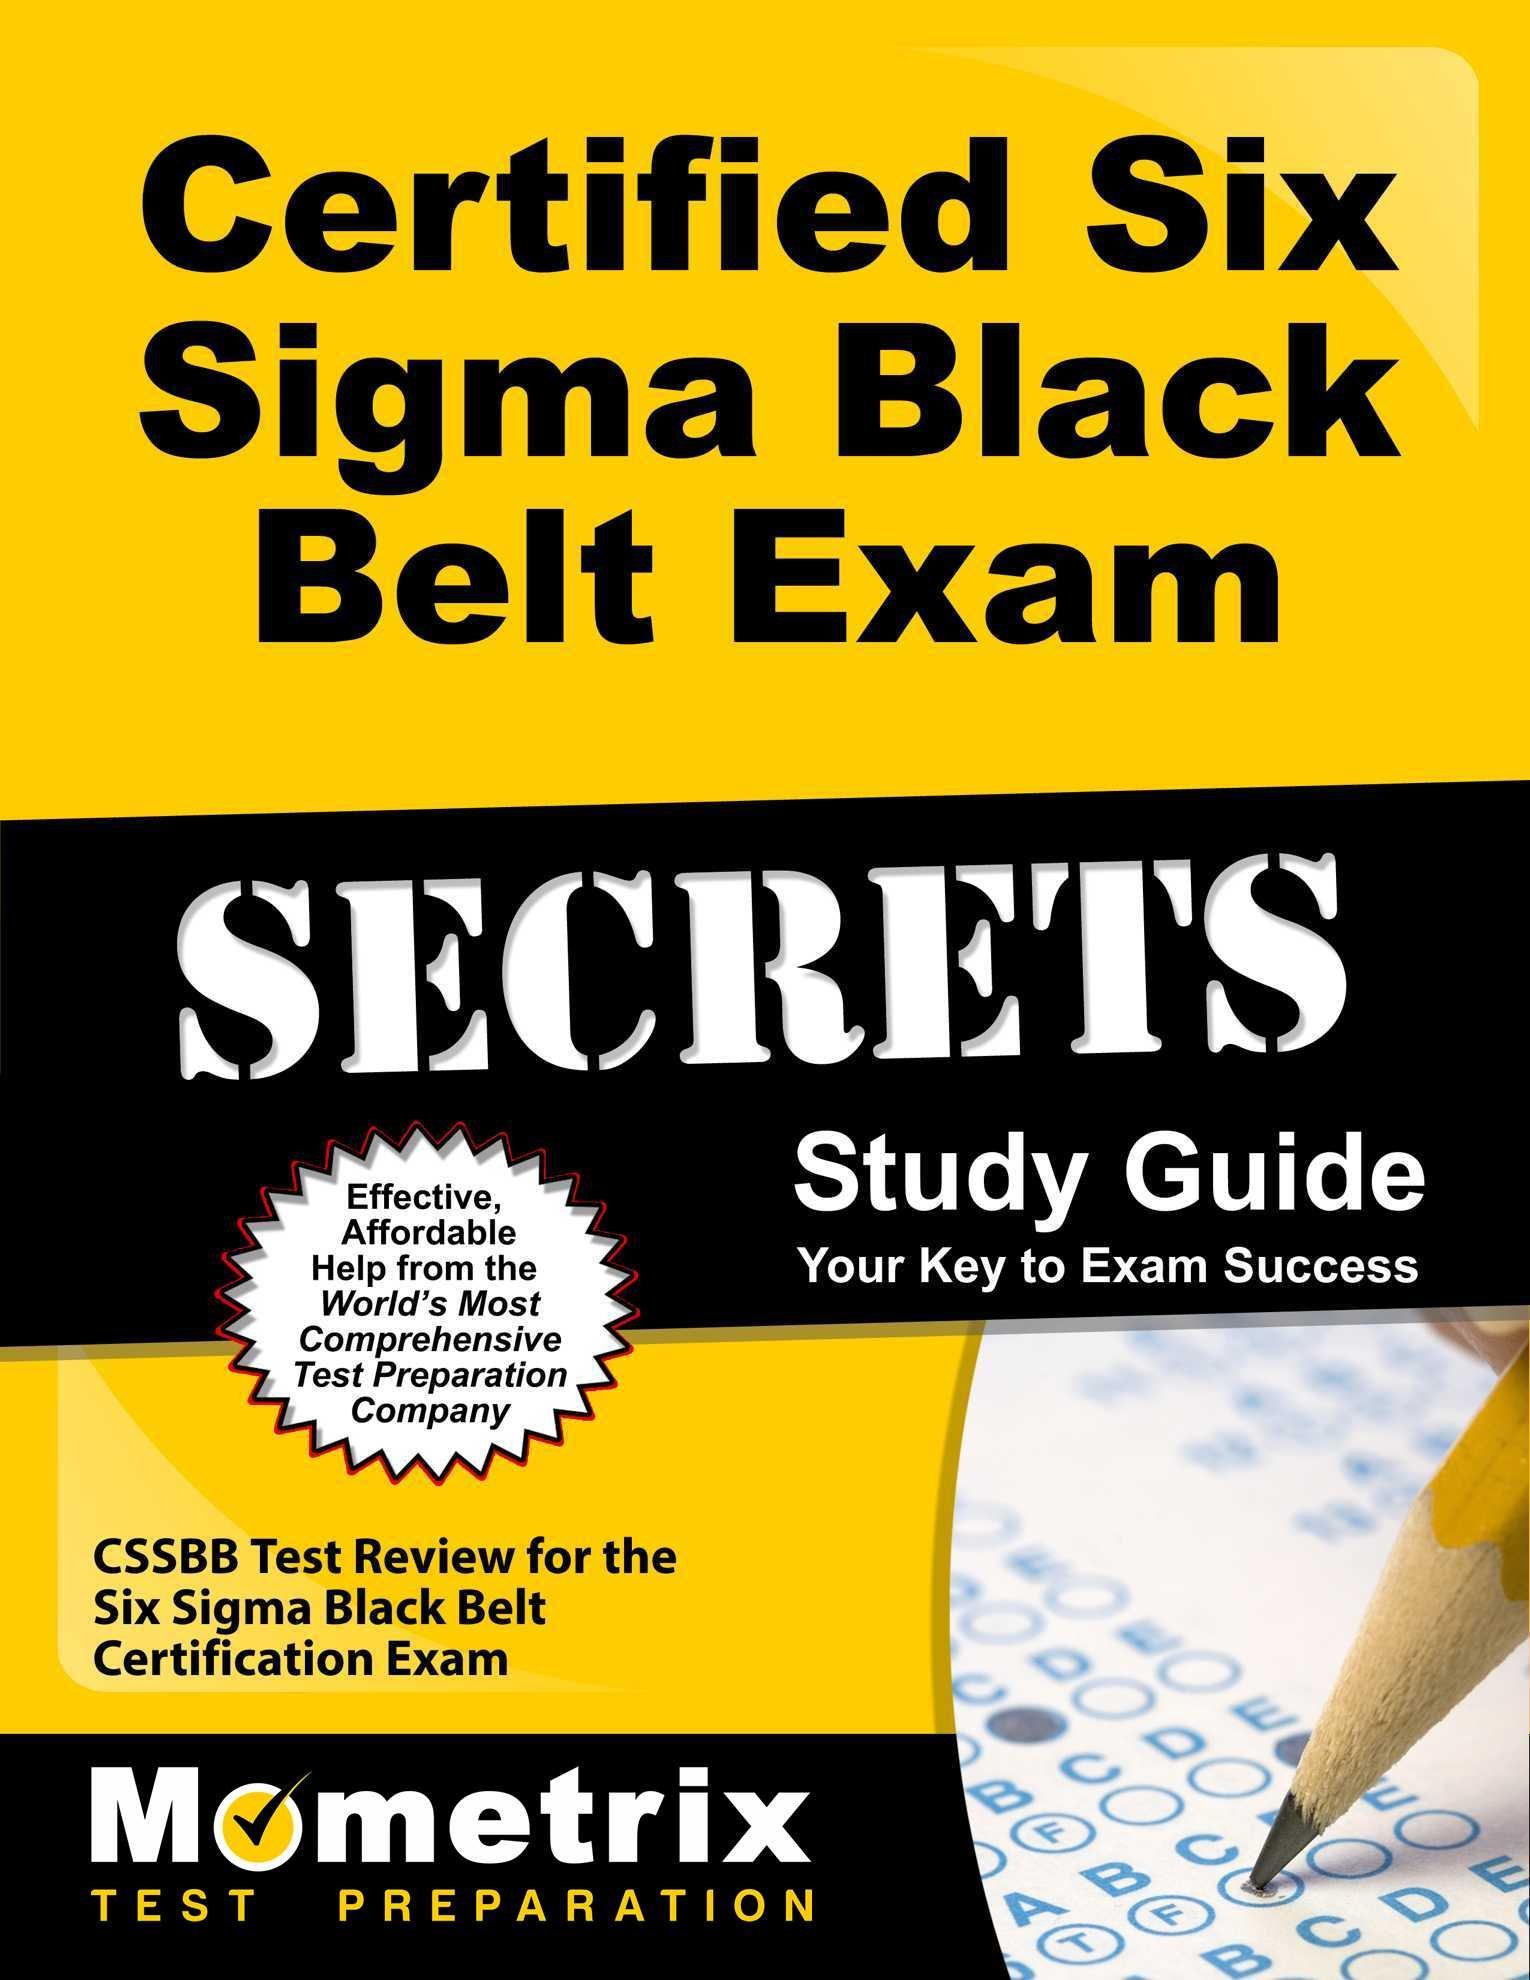 Certified Six Sigma Black Belt Exam Secrets Study Guide Cssbb Test